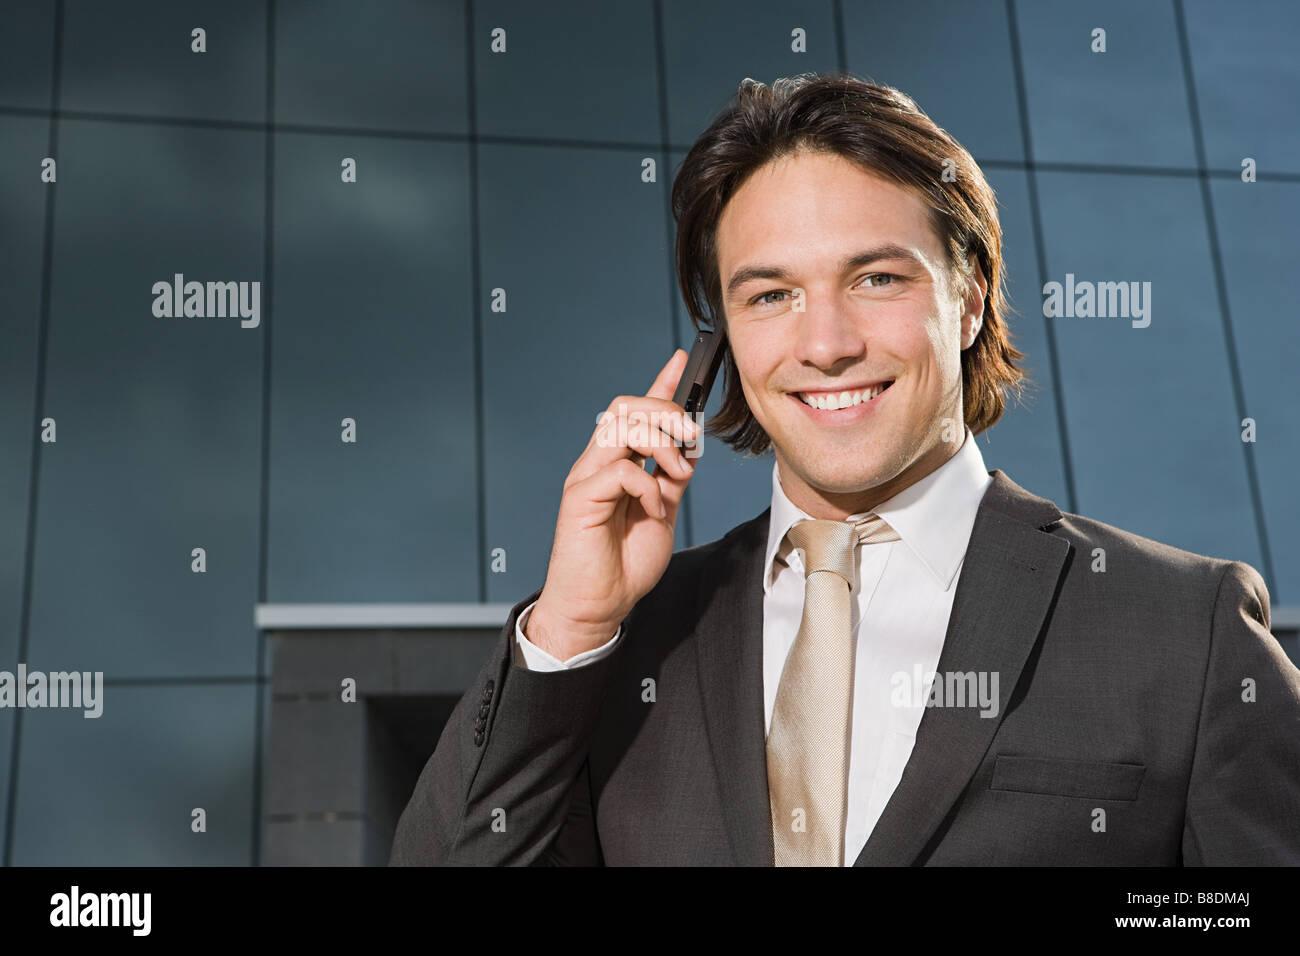 Businessman on cellphone - Stock Image